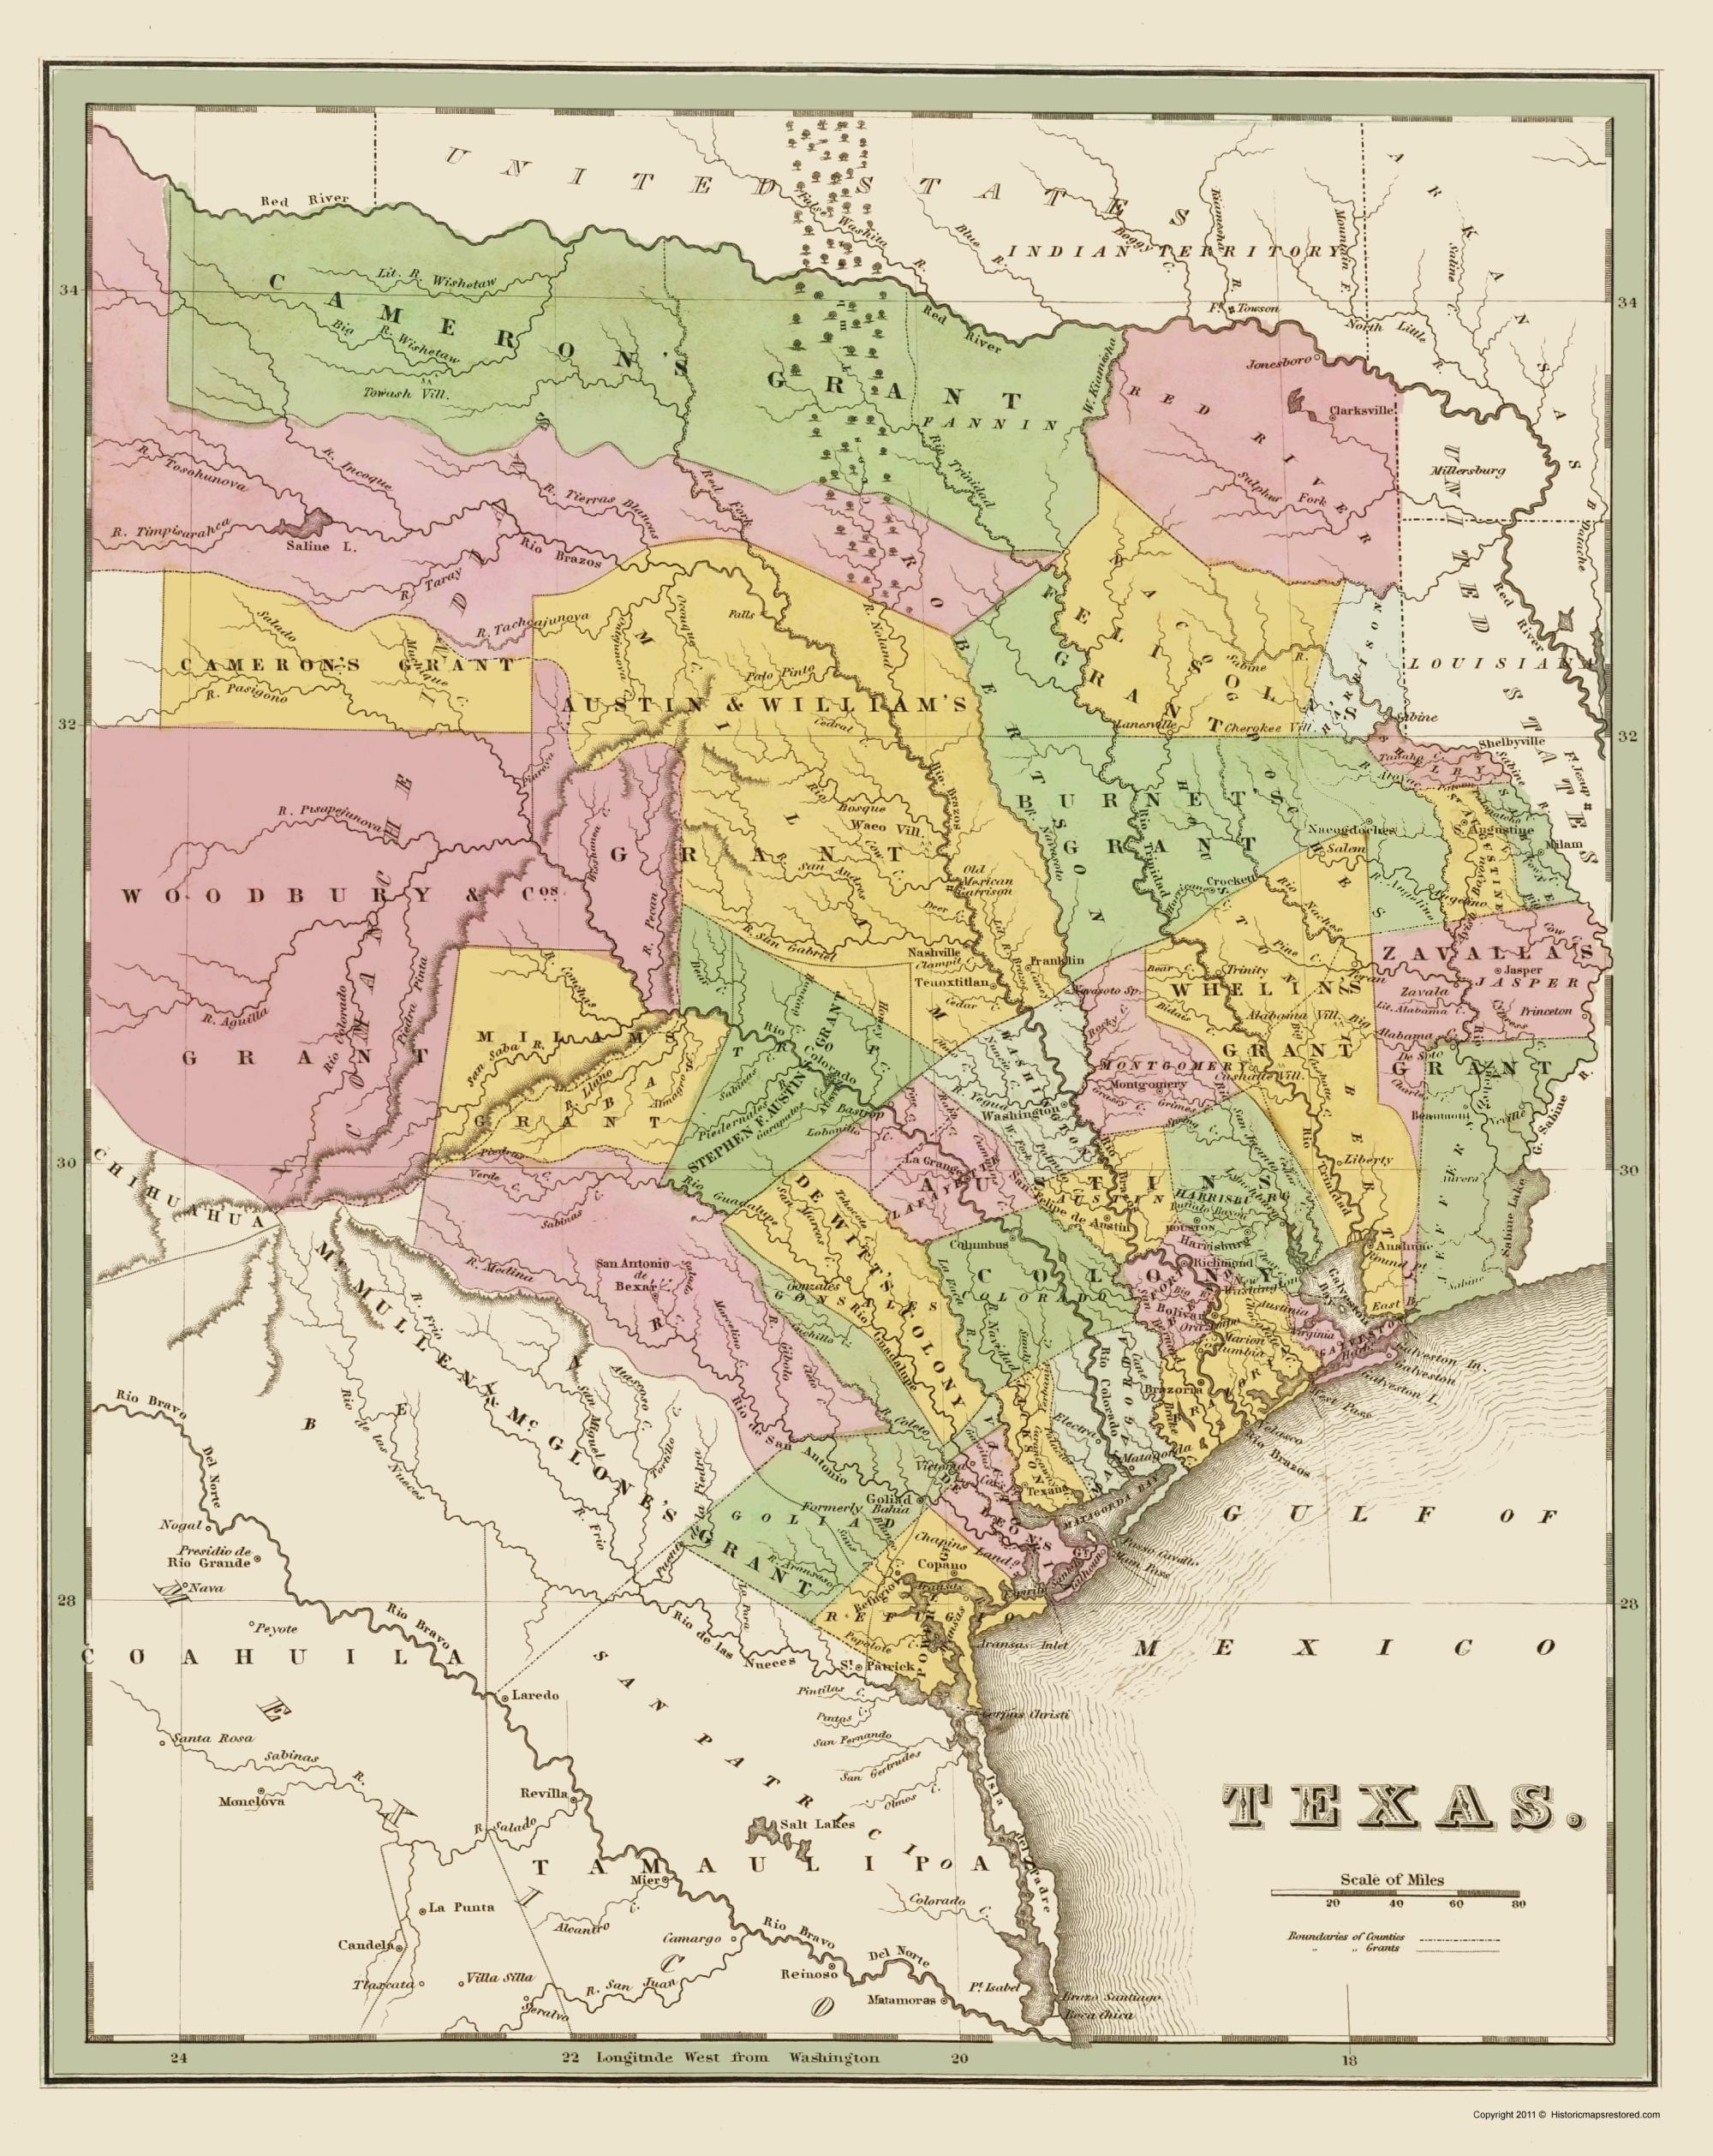 Old State Map - Texas Eastern Landowner Grants - dford 1838 - 23 x on west galveston island map, eastern co map, west university map, west portland map, west state map, west houston map, west wi map, texas map, west south carolina map, west id map, west plano map, west jacksonville map, west ms map, west missouri map, west irving map, west fla map, west atlanta map, west texas, west pa map, west maryland map,